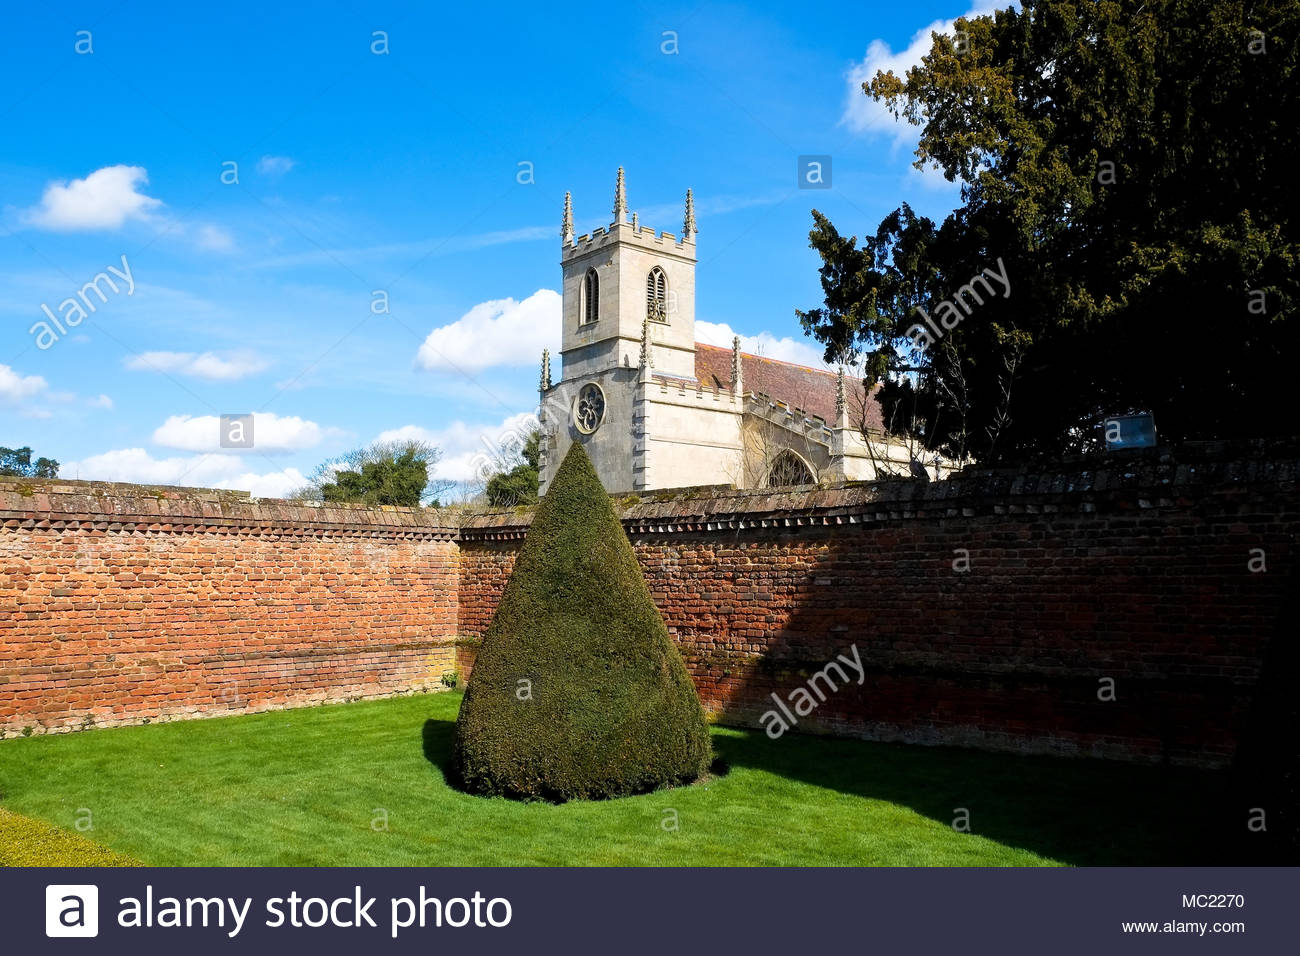 Church of St Peter, Doddington, Lincolnshire, UK. - Stock Image